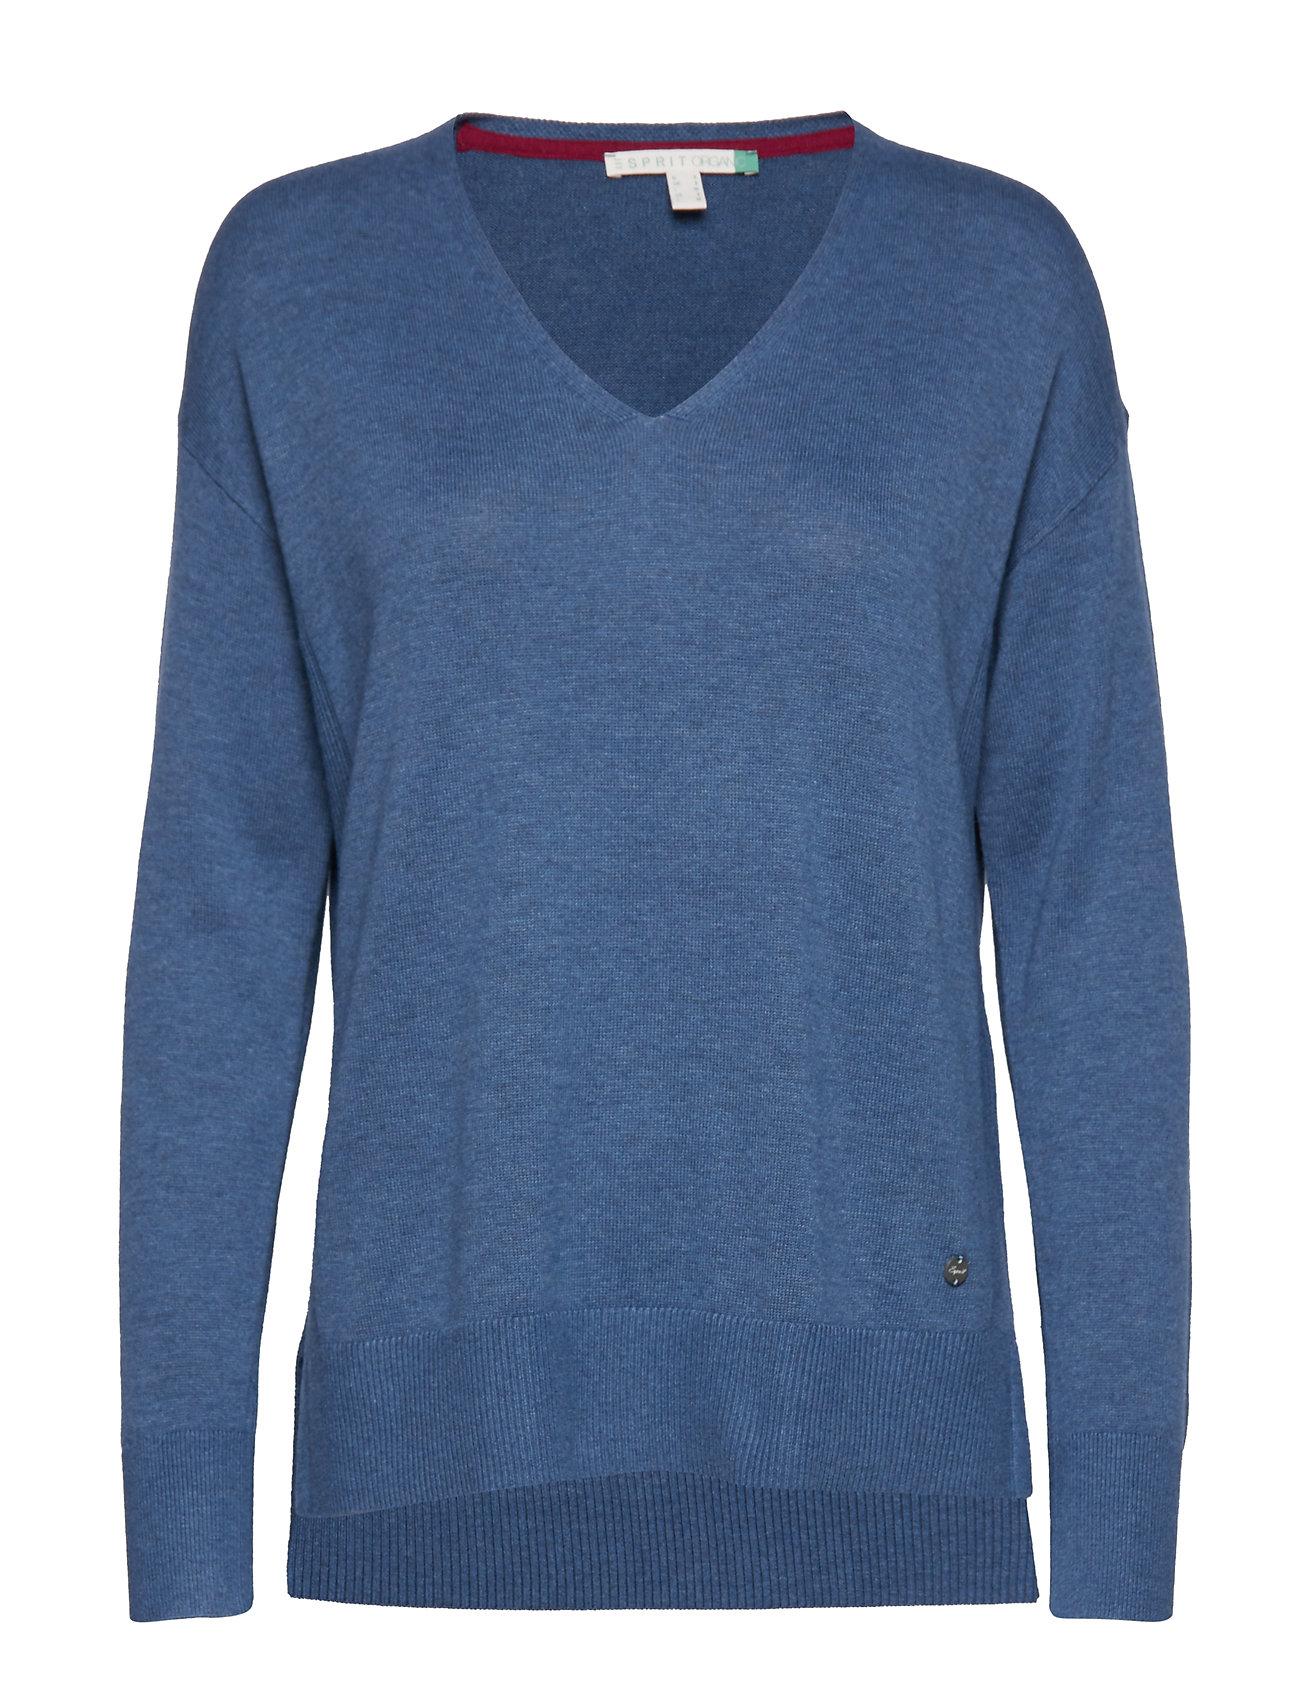 Casual Sweatersgrey 5Esprit Sweatersgrey Blue Casual Blue Blue 5Esprit Sweatersgrey 0Pwnk8OX